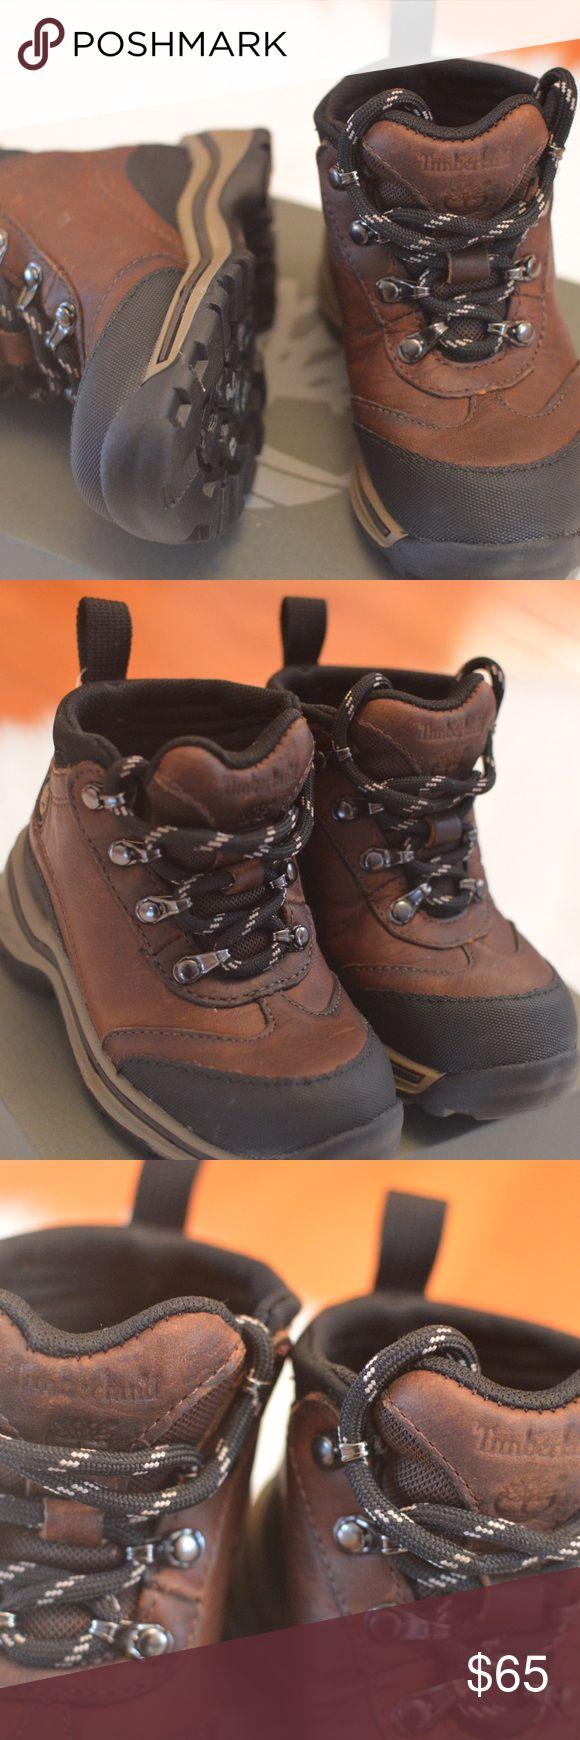 toddler boy timberland boots price match